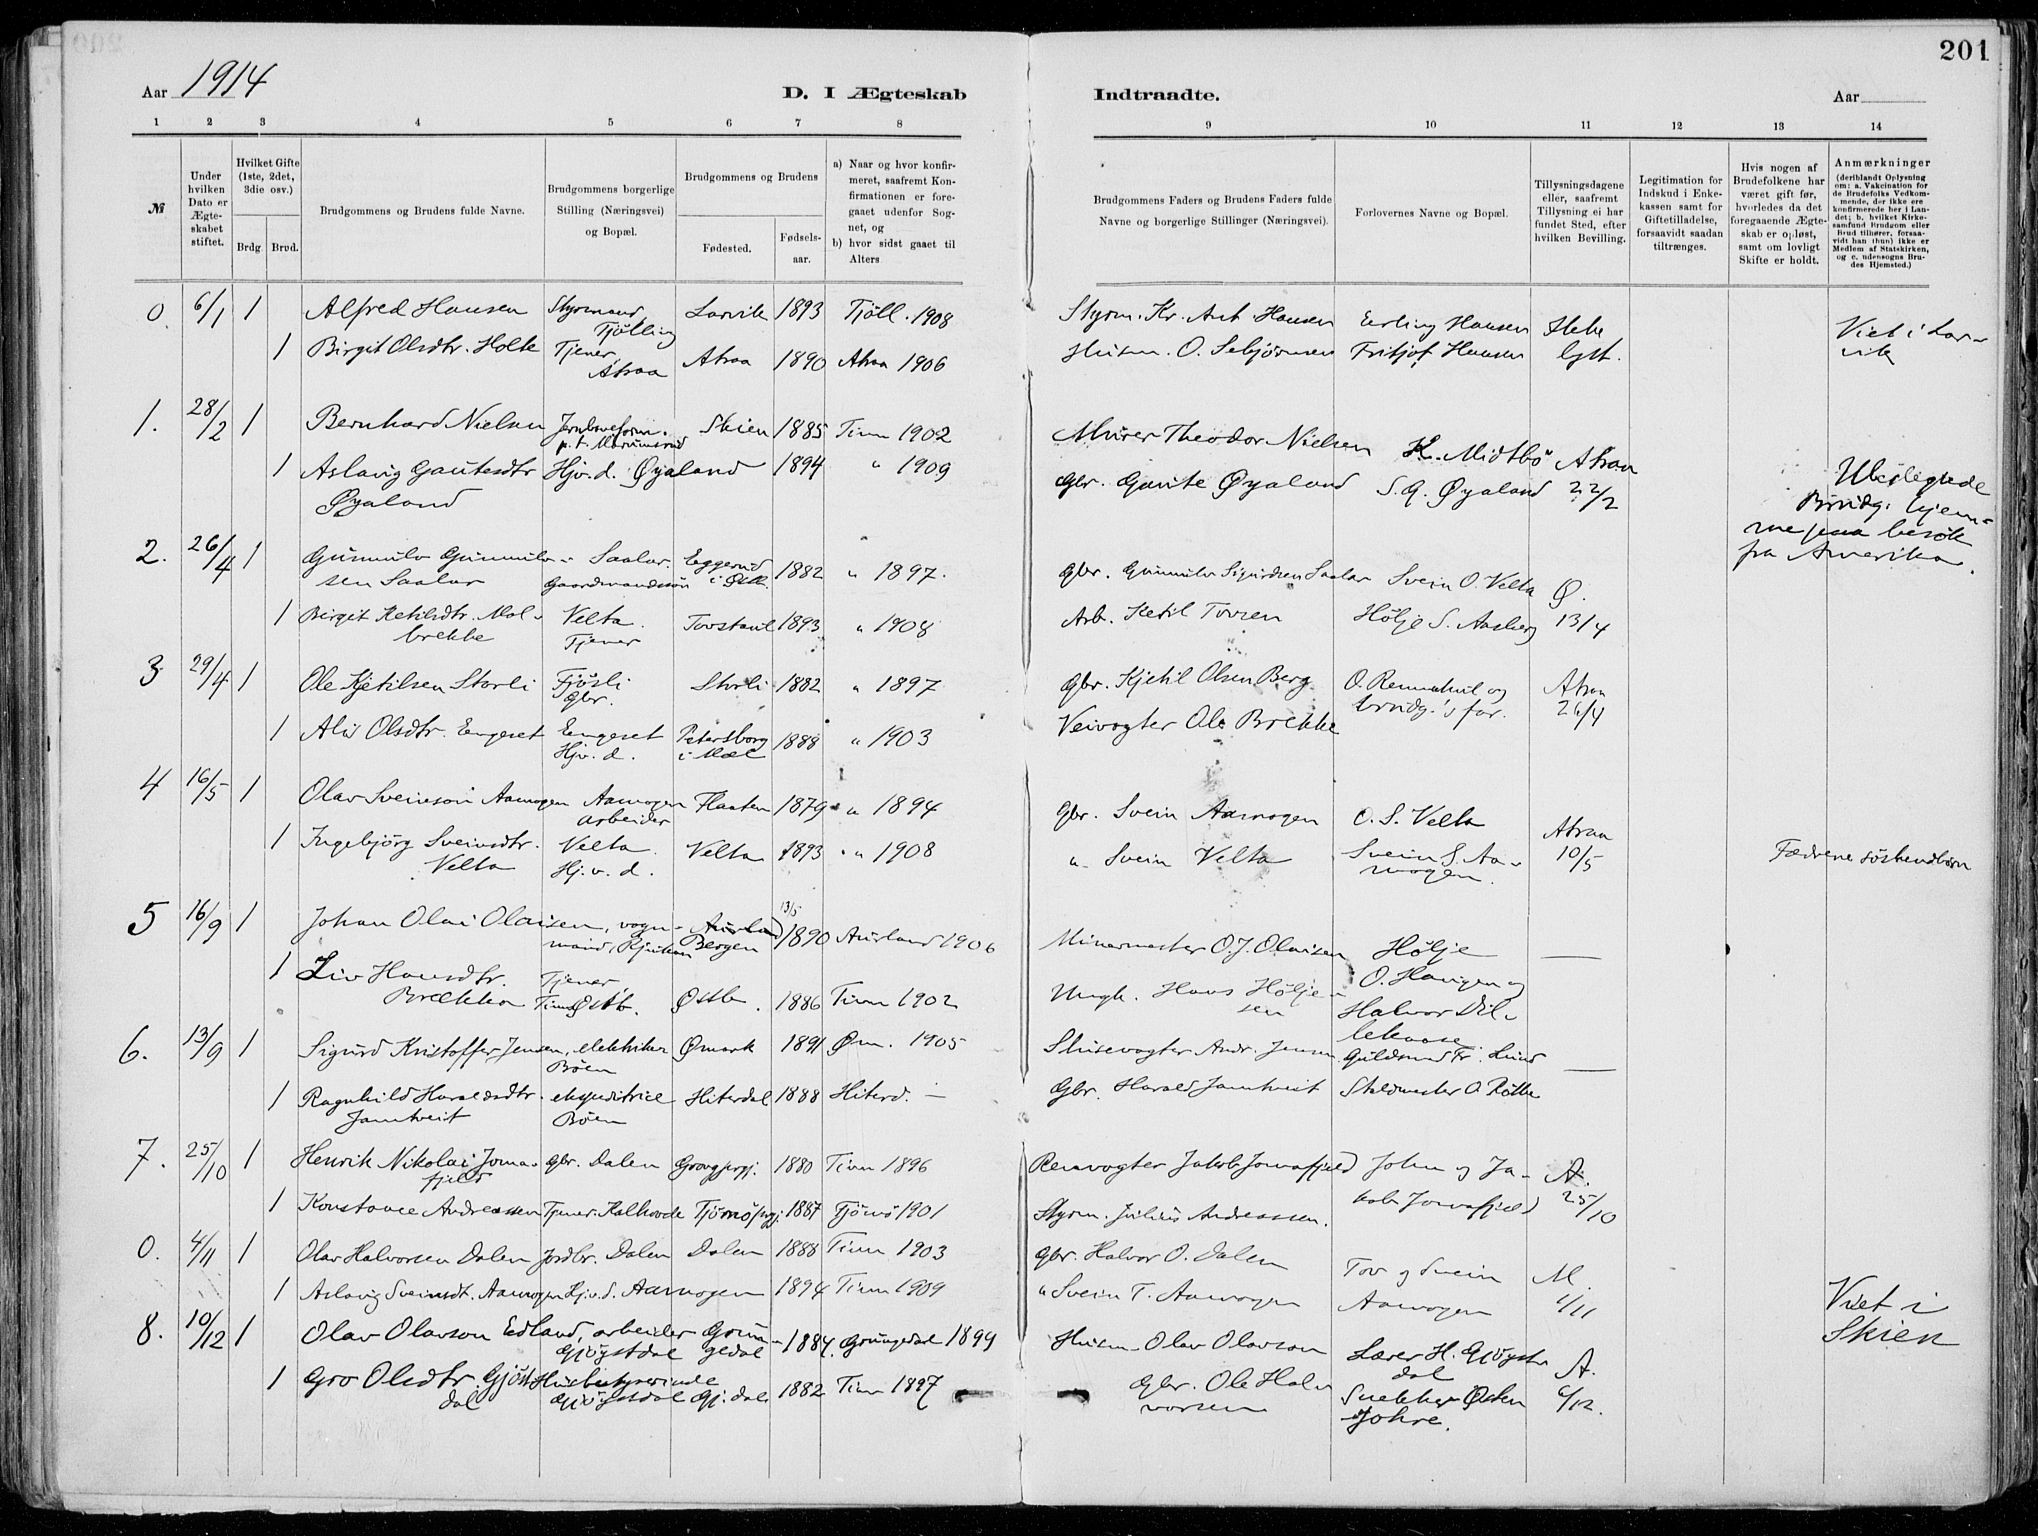 SAKO, Tinn kirkebøker, F/Fa/L0007: Ministerialbok nr. I 7, 1878-1922, s. 201